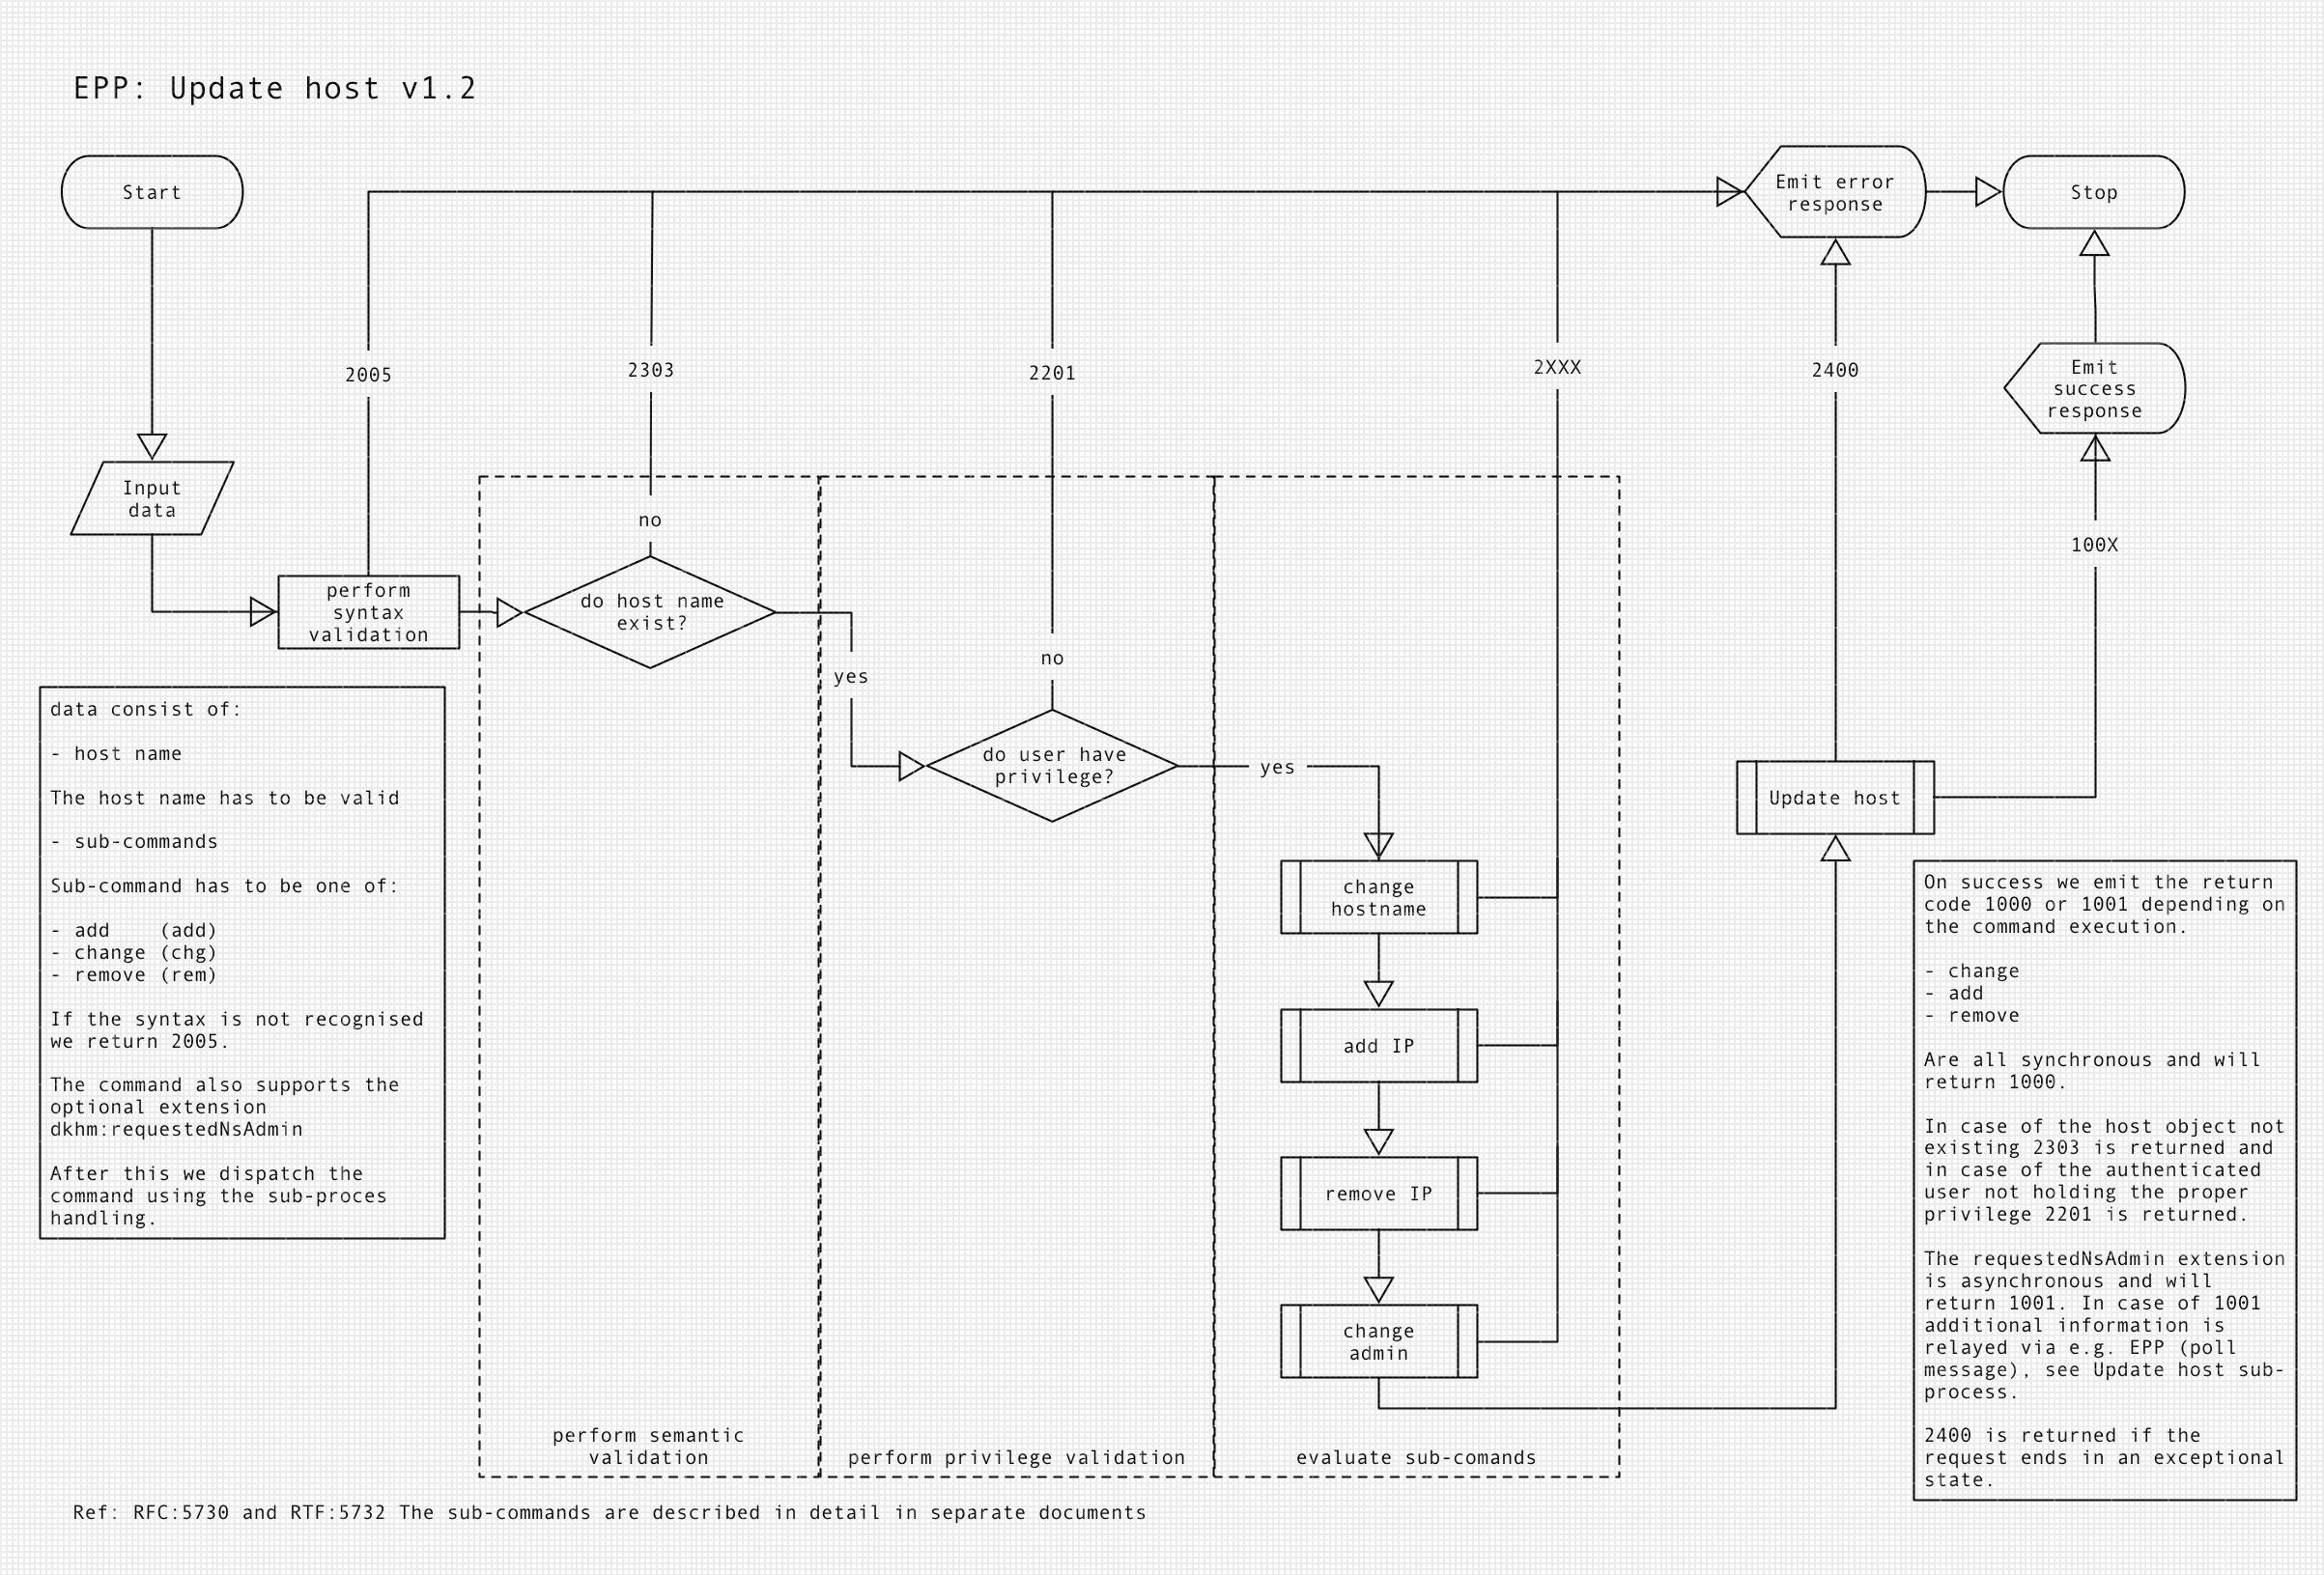 Diagram of EPP update host